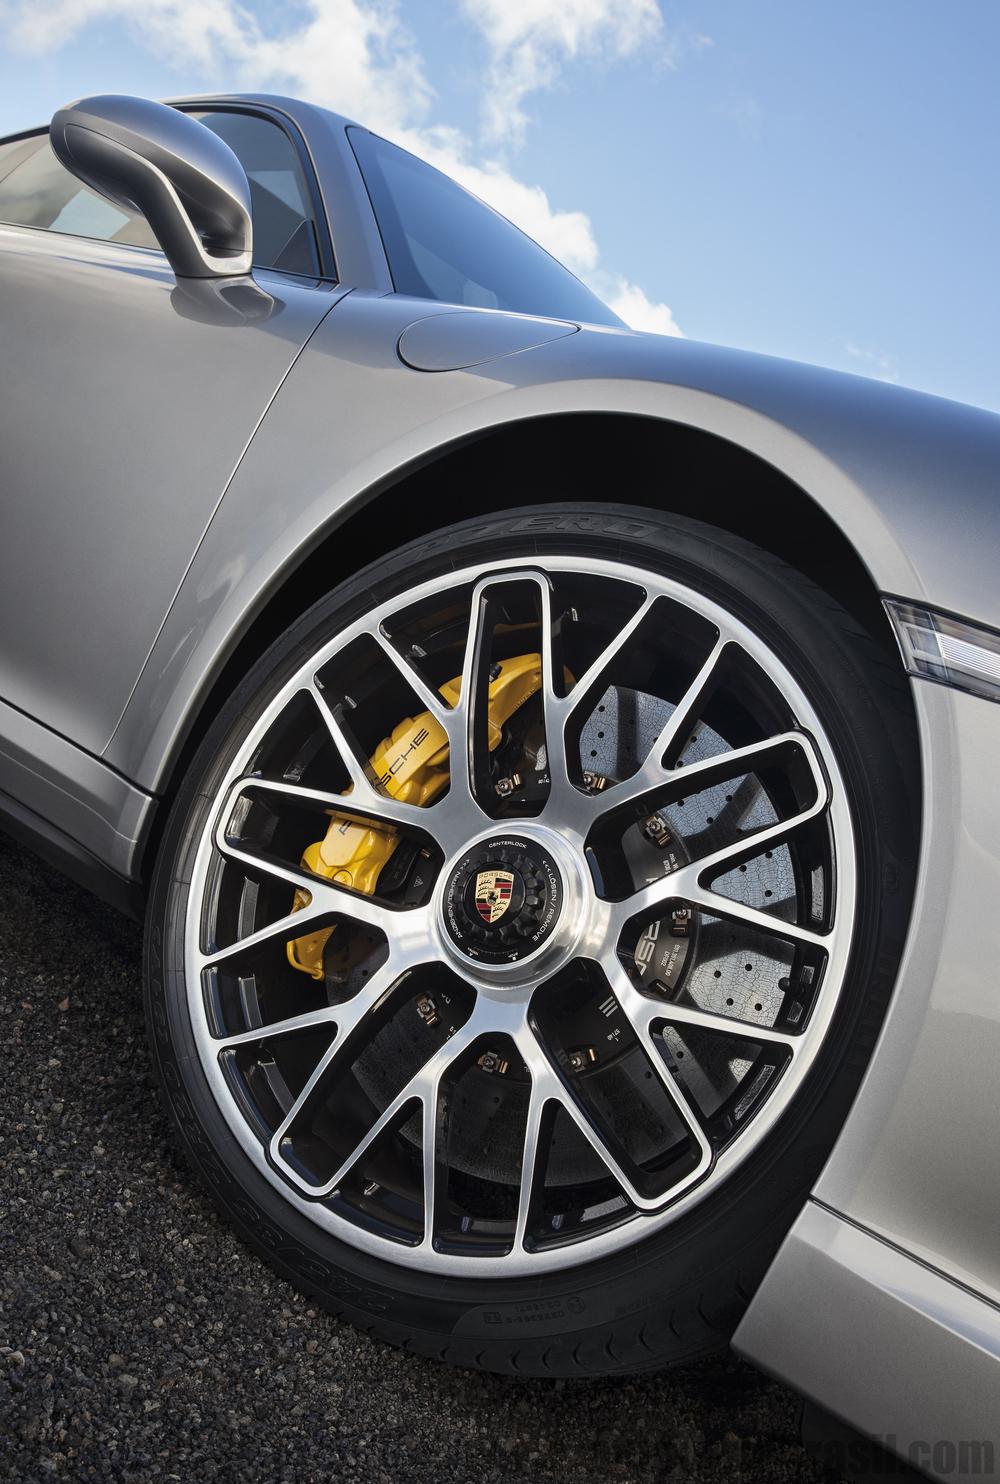 Porsche_Turbo_S 11.jpg